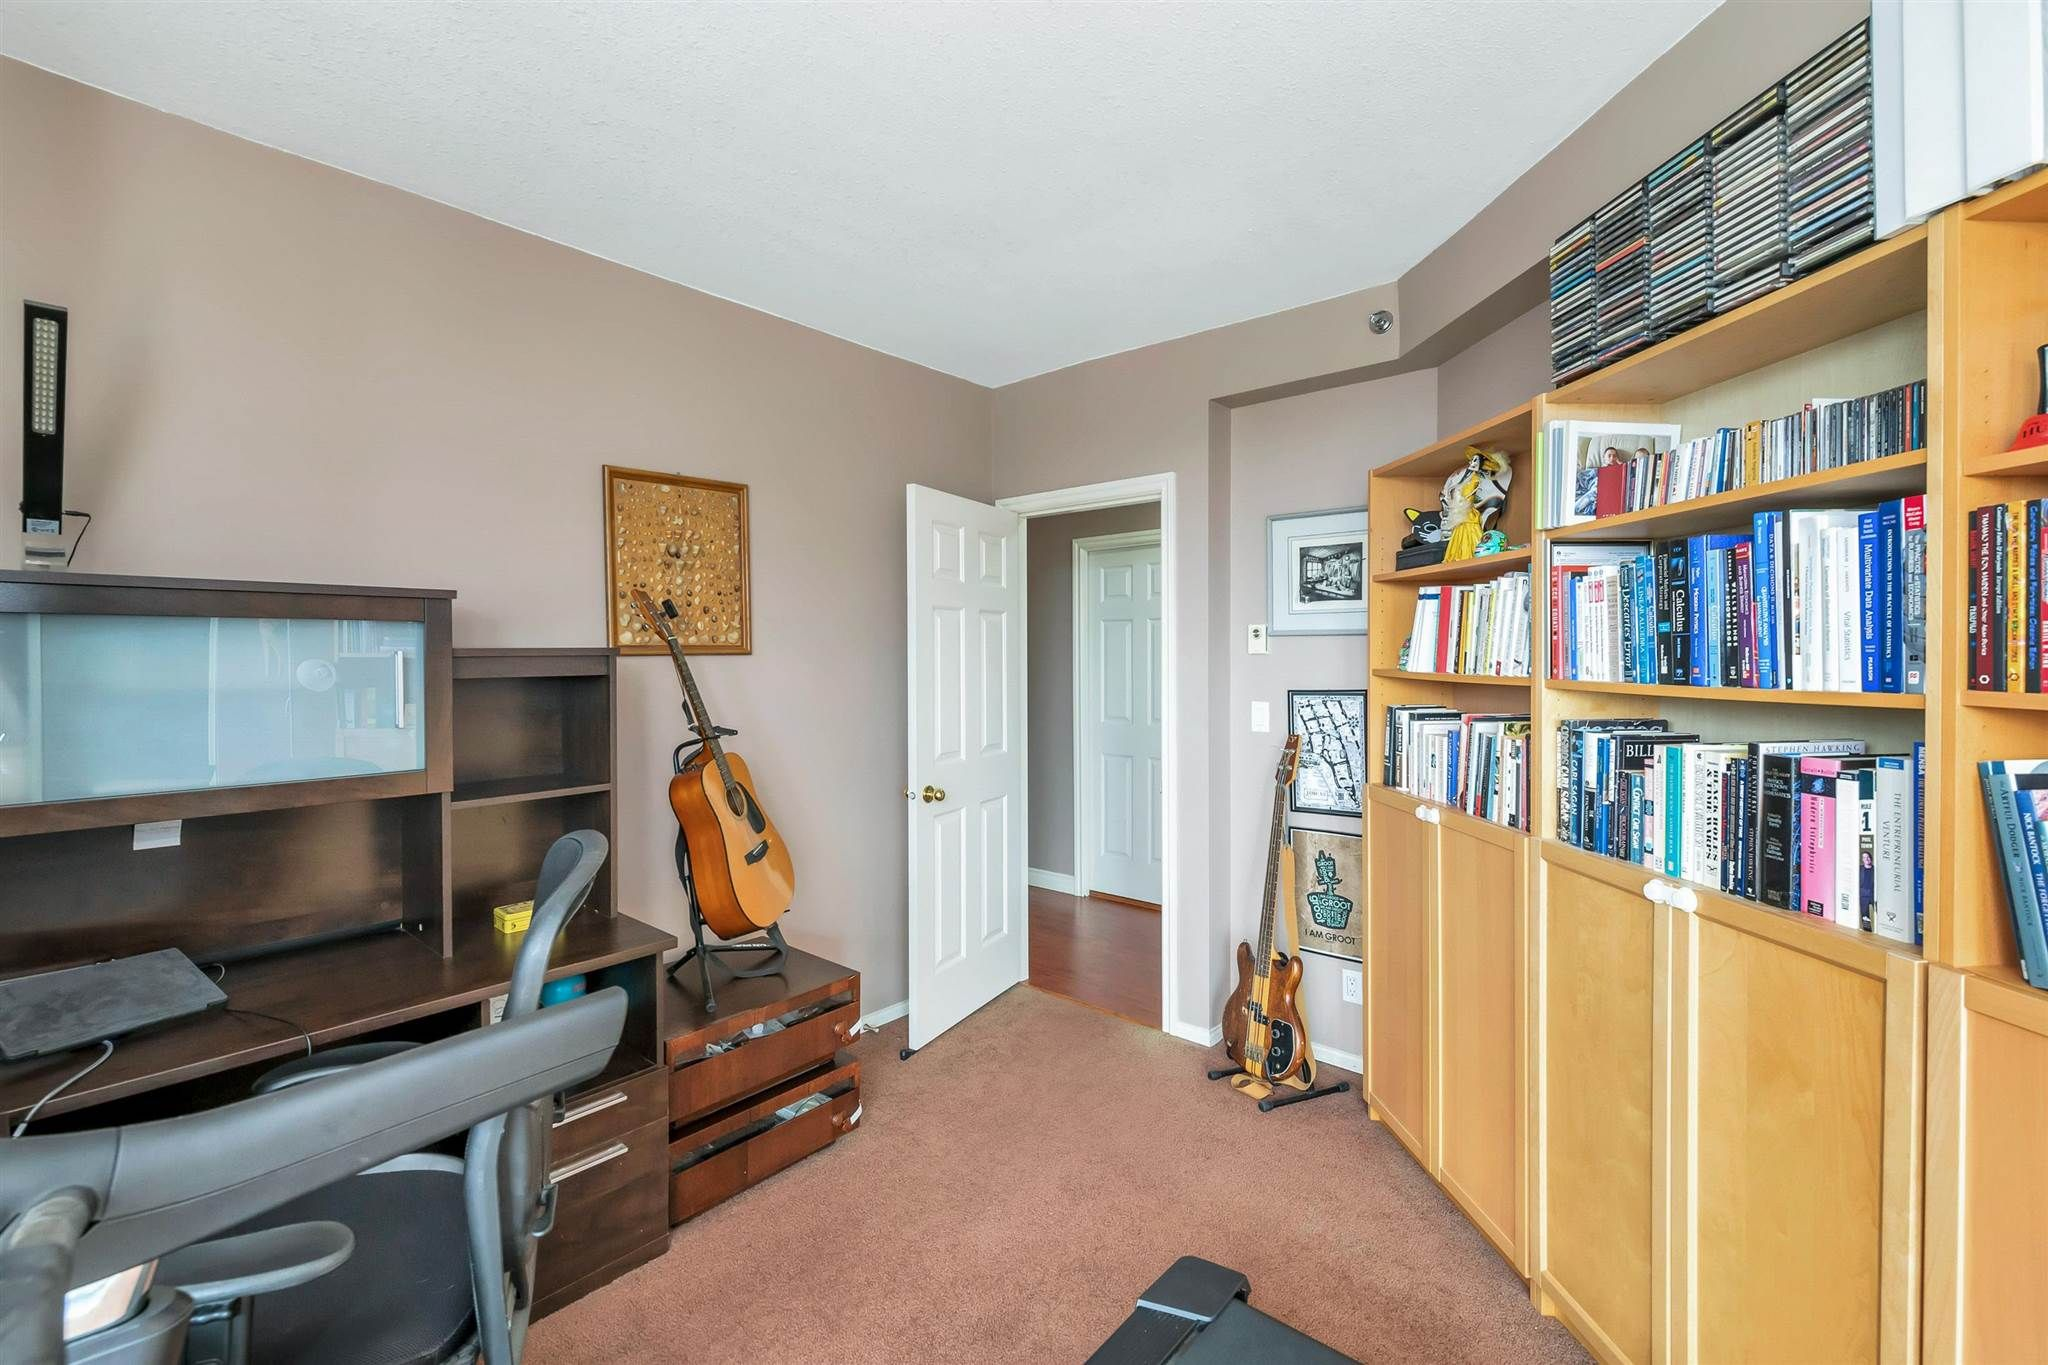 "Photo 25: Photos: 1401 728 FARROW Street in Coquitlam: Coquitlam West Condo for sale in ""THE VICTORIA"" : MLS®# R2615321"